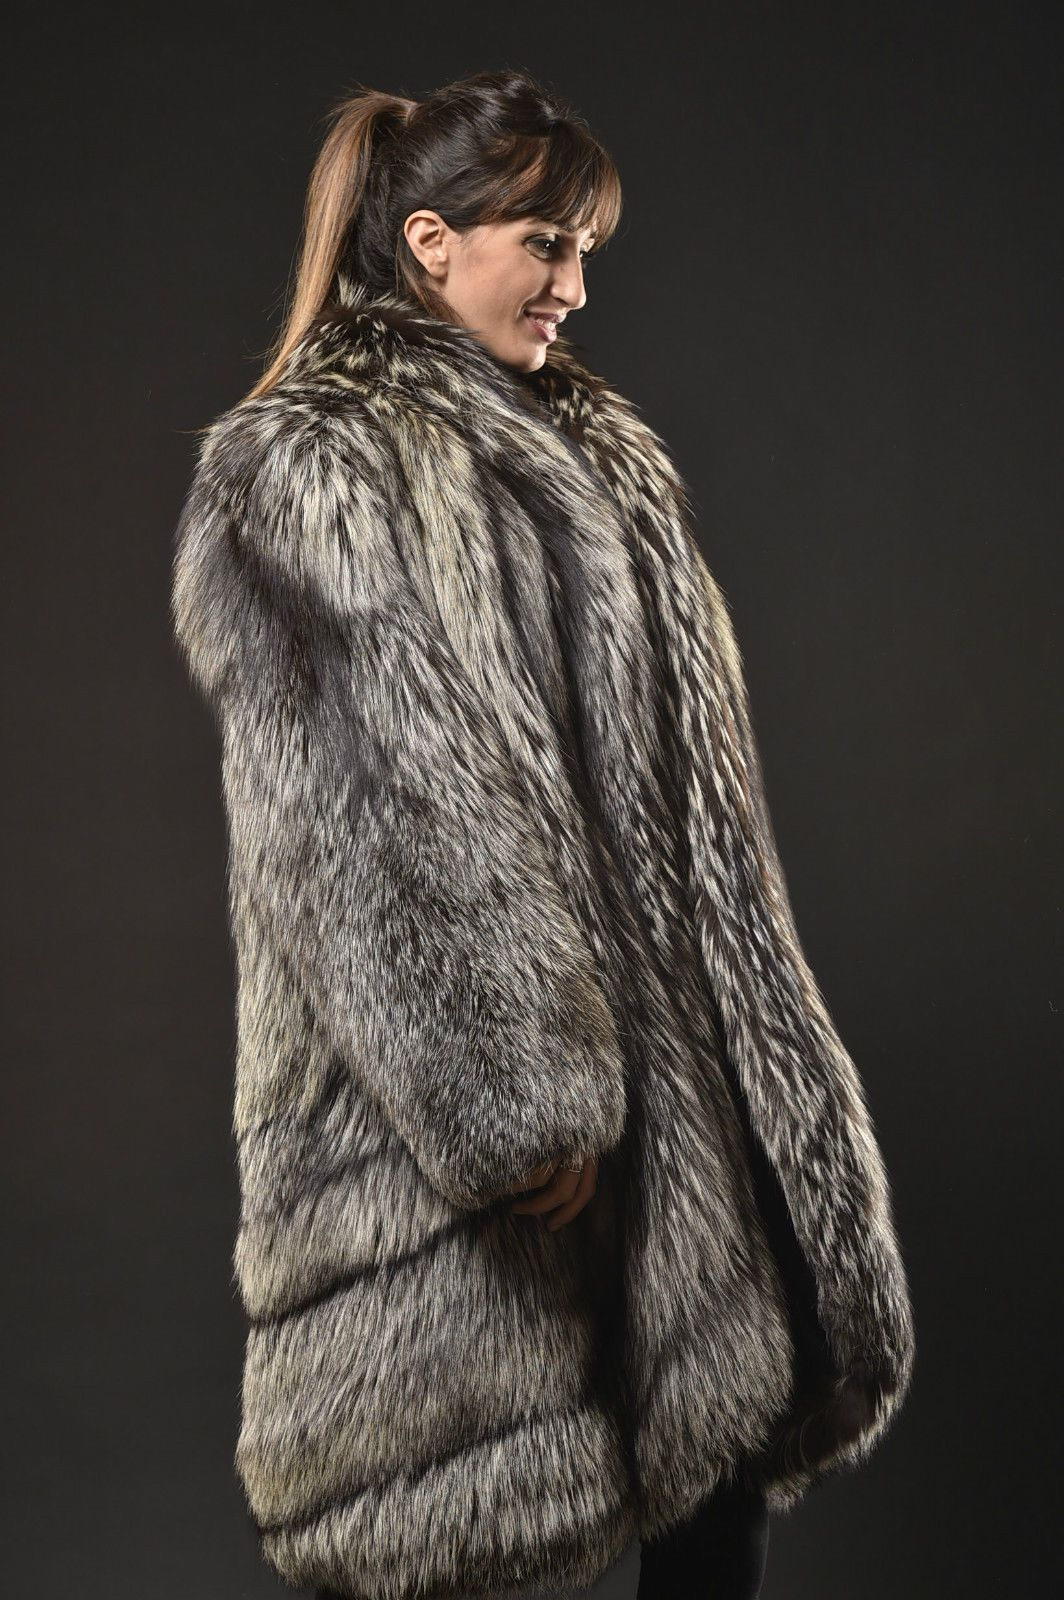 silver fox fur coat manteau pelisse fourrure renard argent pelliccia volpe ebay fourrures. Black Bedroom Furniture Sets. Home Design Ideas